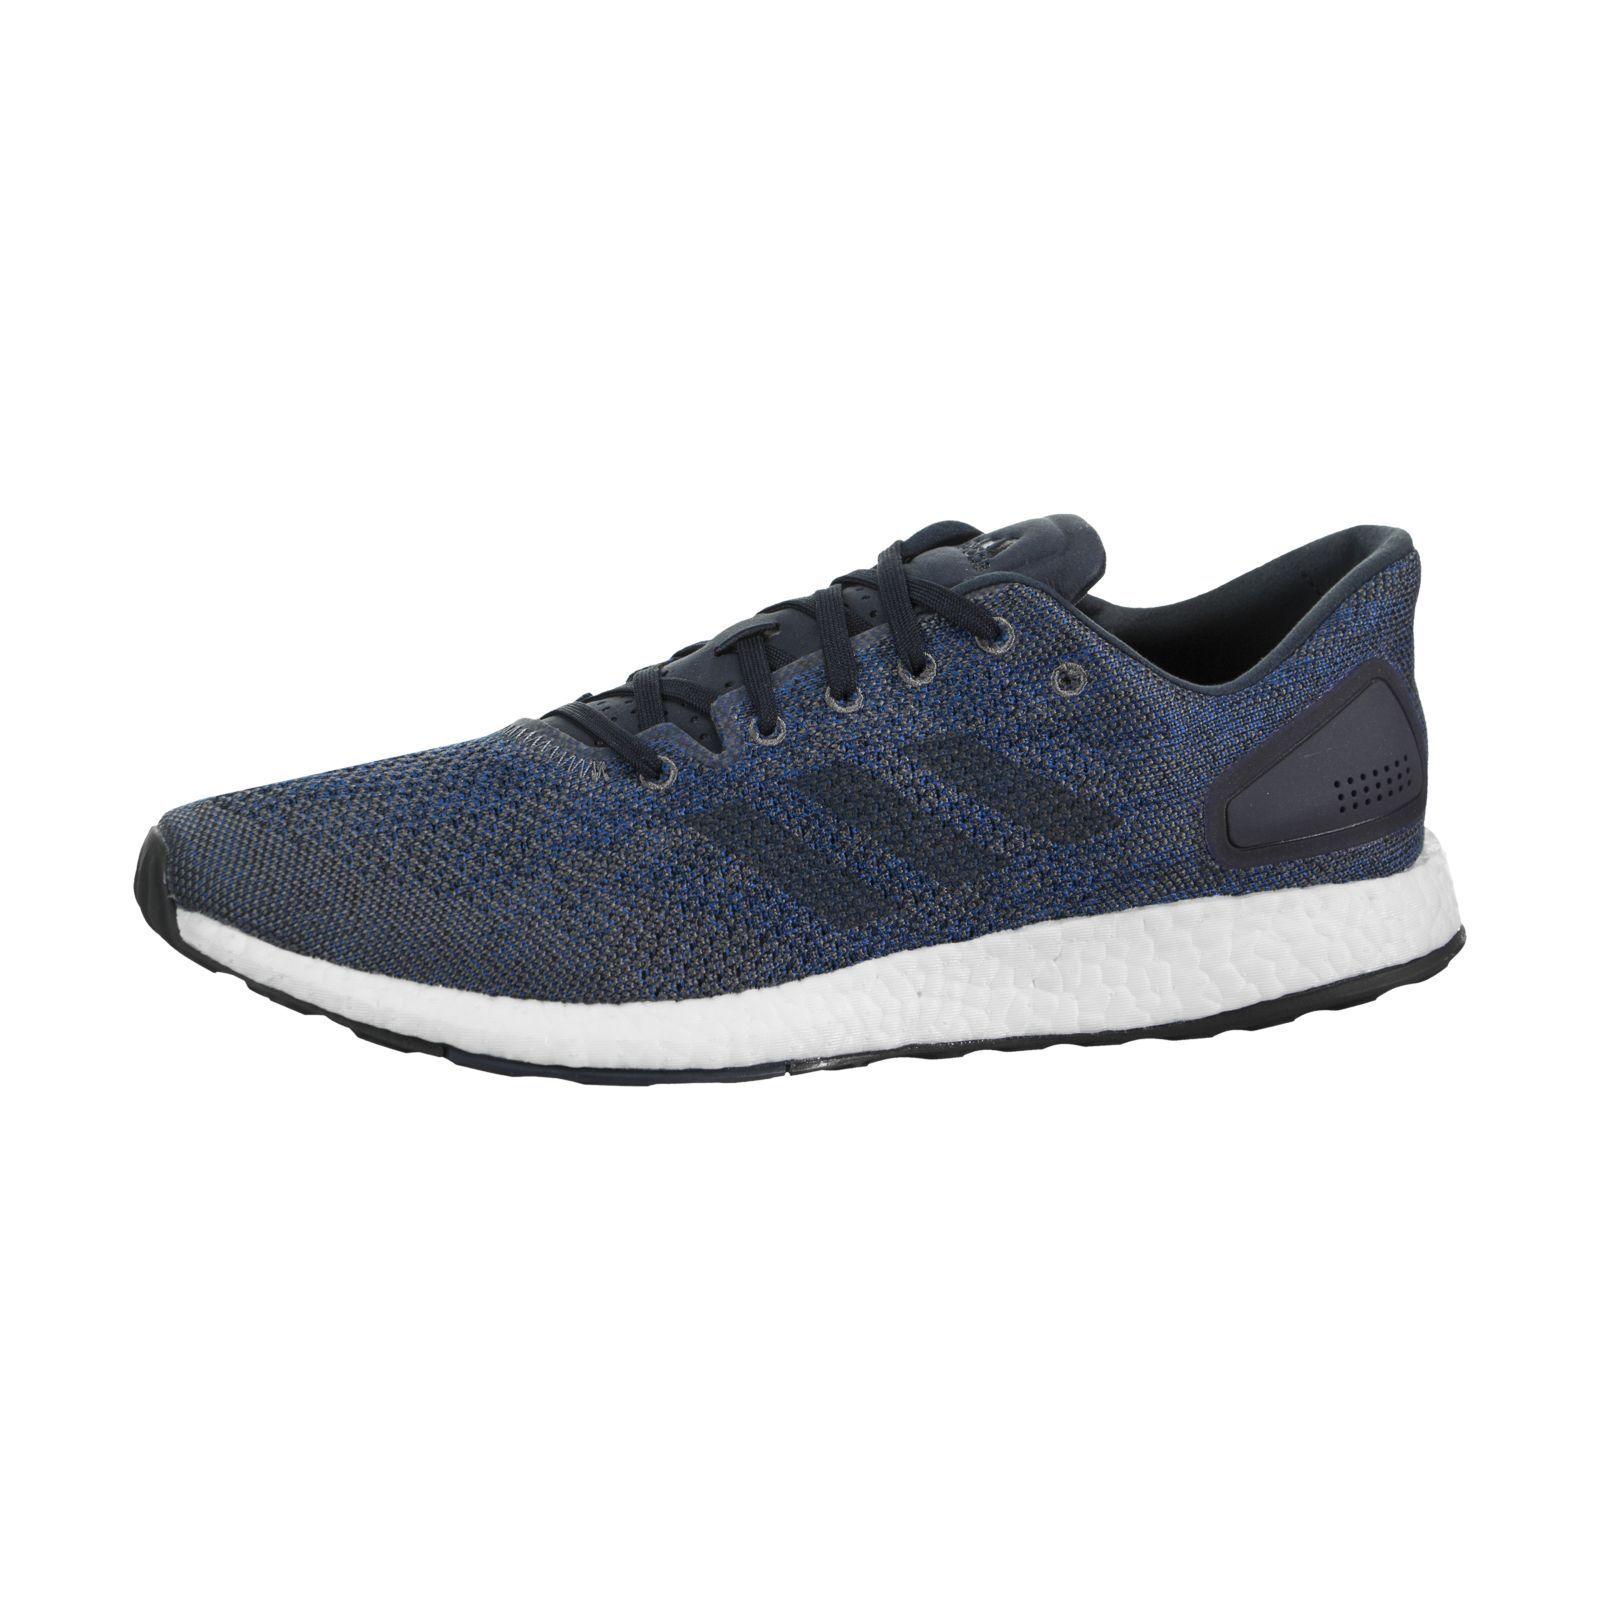 Cheap Nice Adidas PureBOOST DPR on the sale